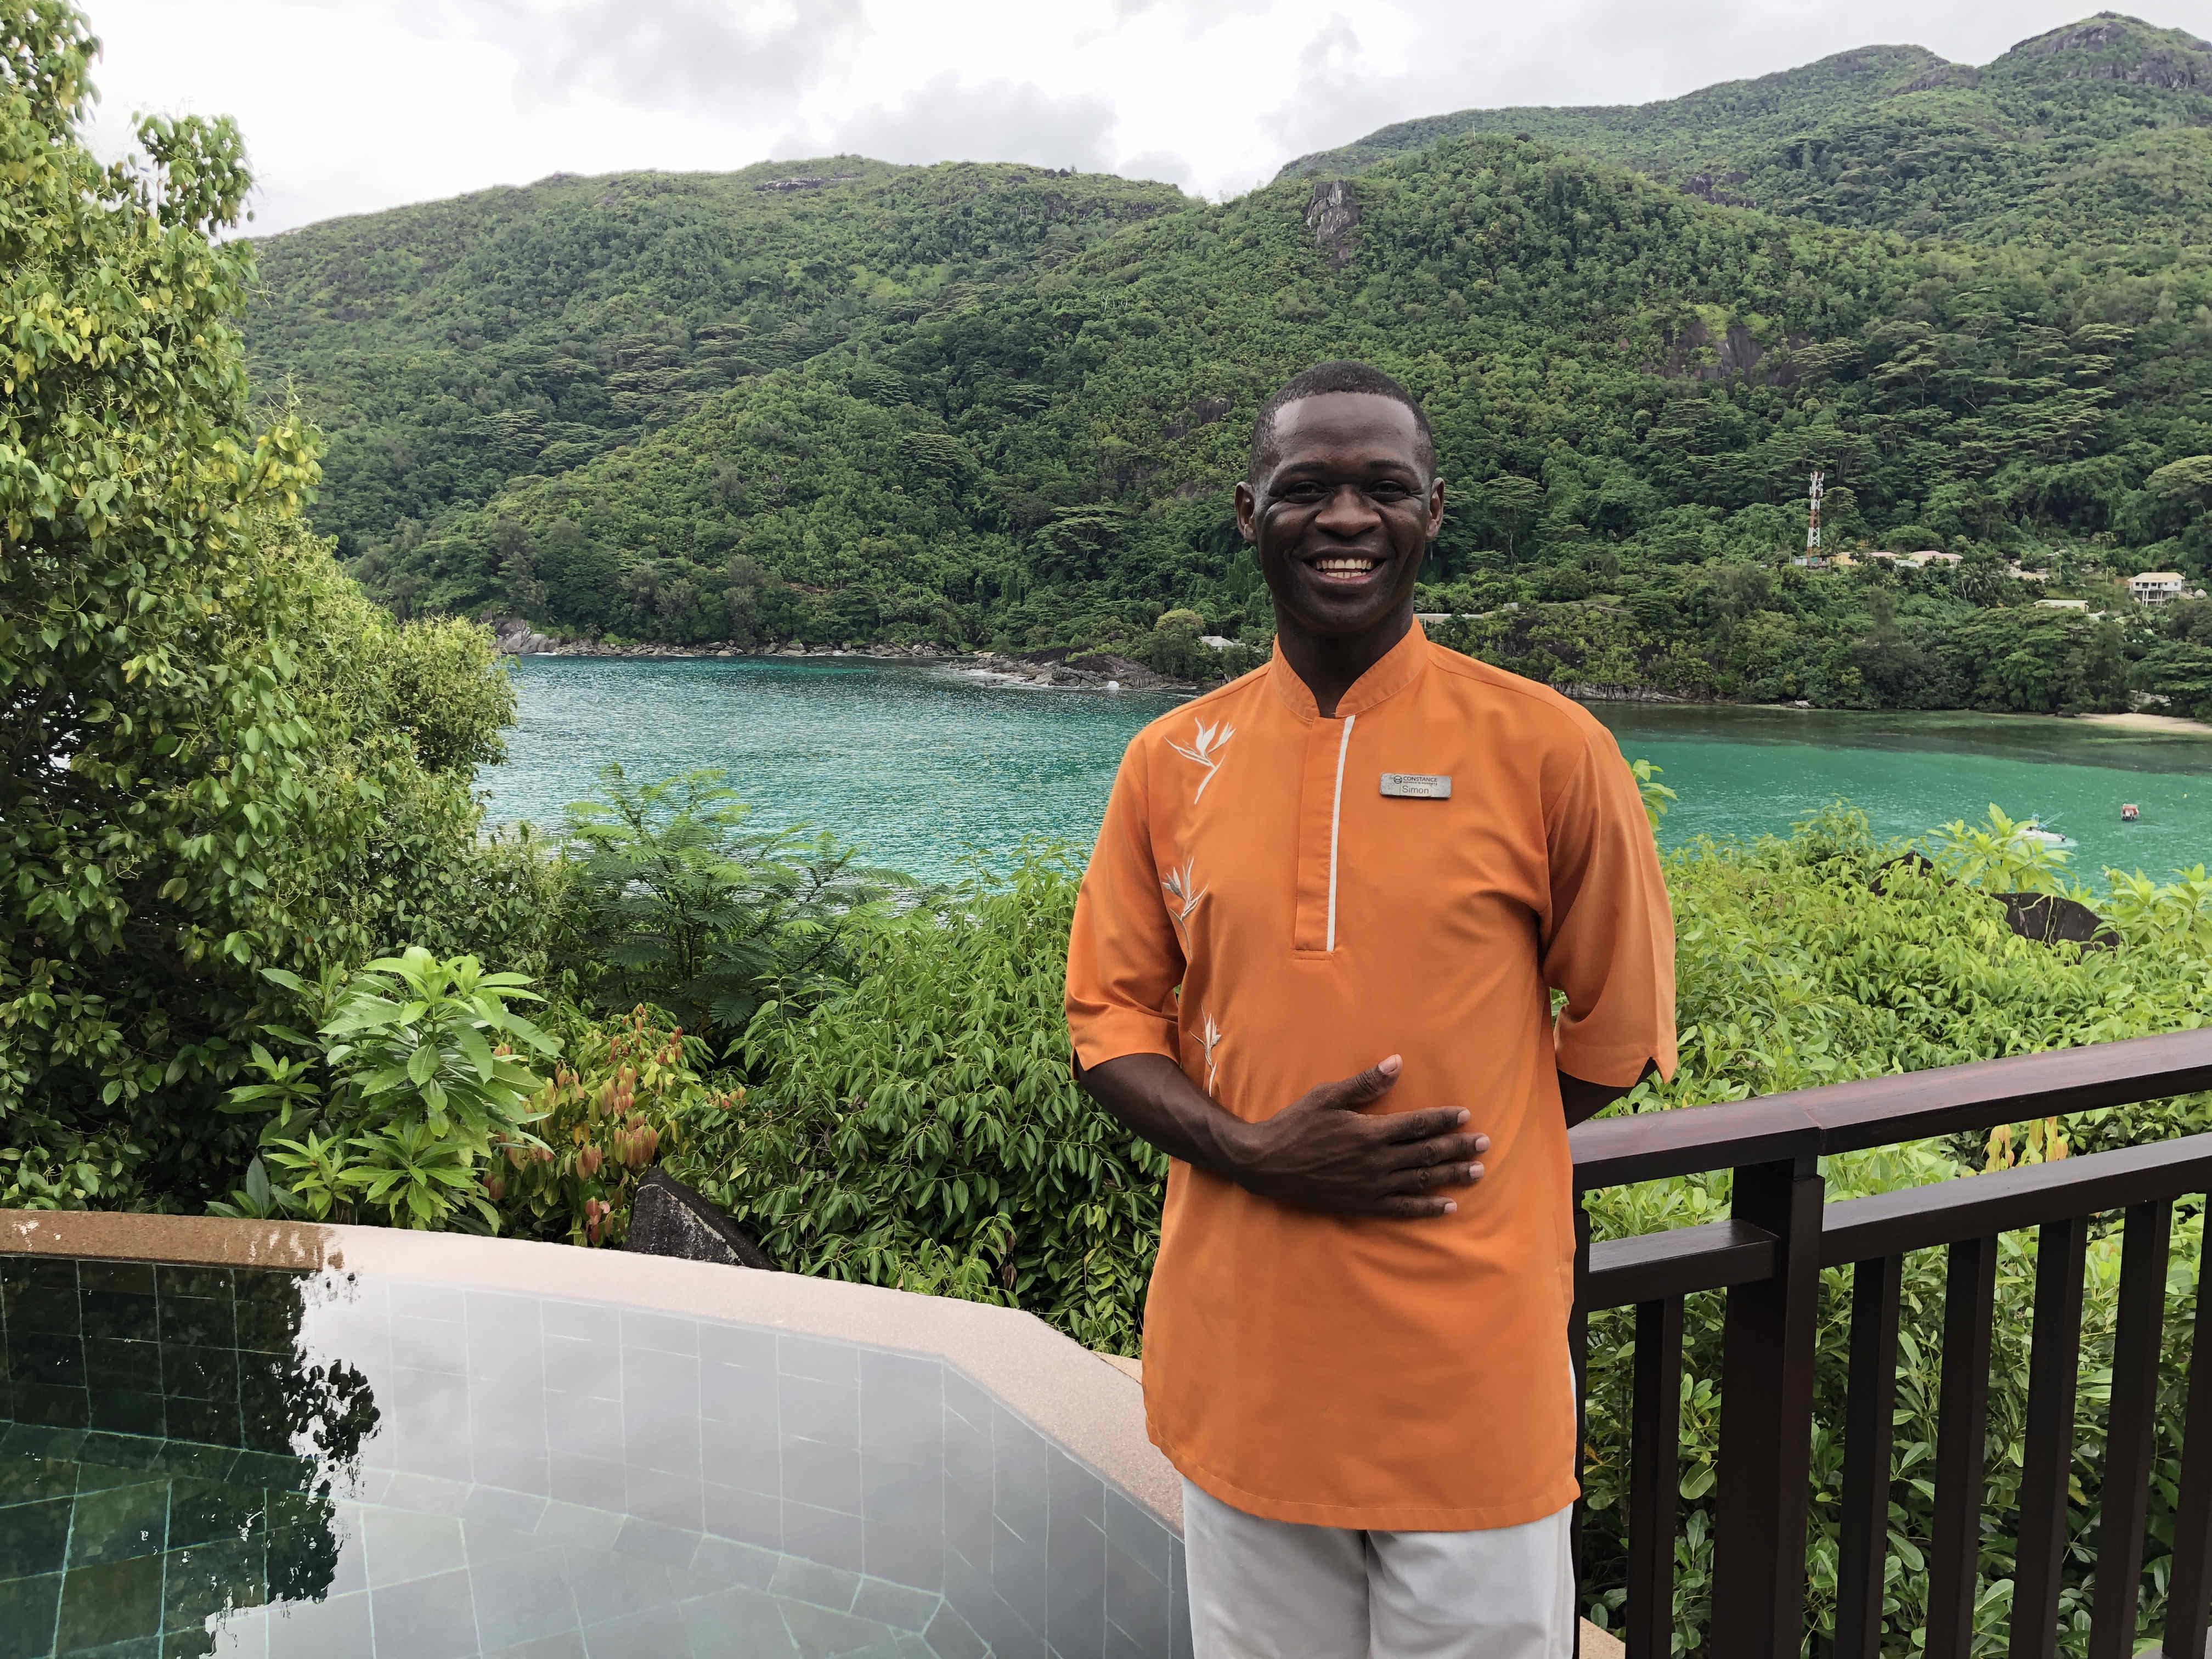 Simon, the amazing staff member at the Constance Ephelia resort.